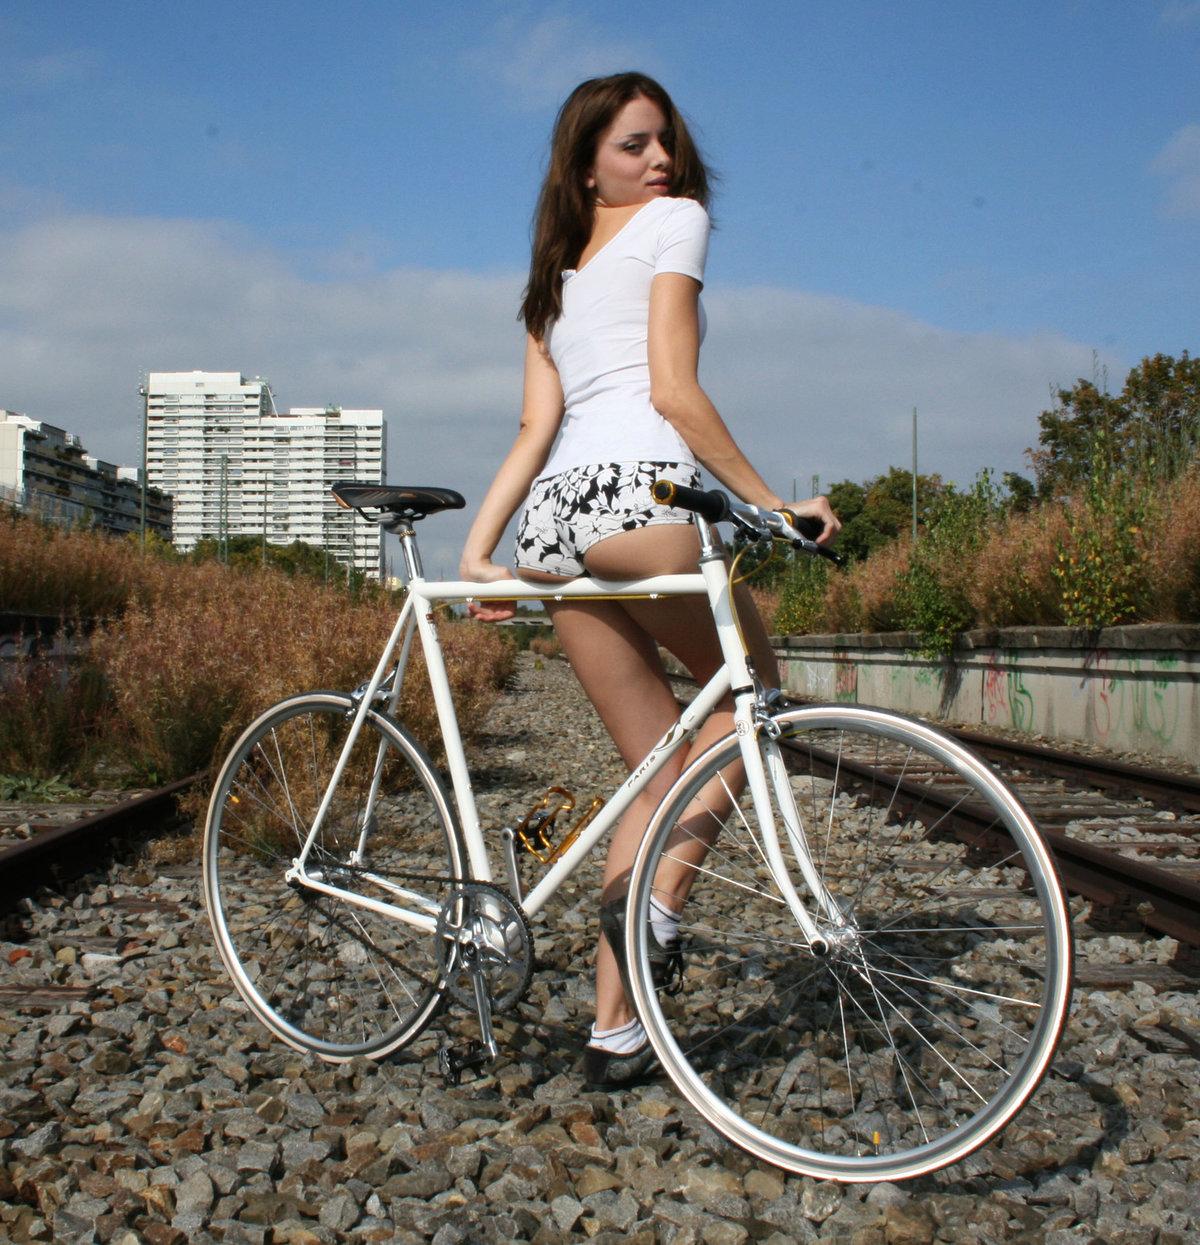 girl-masterbates-on-bike